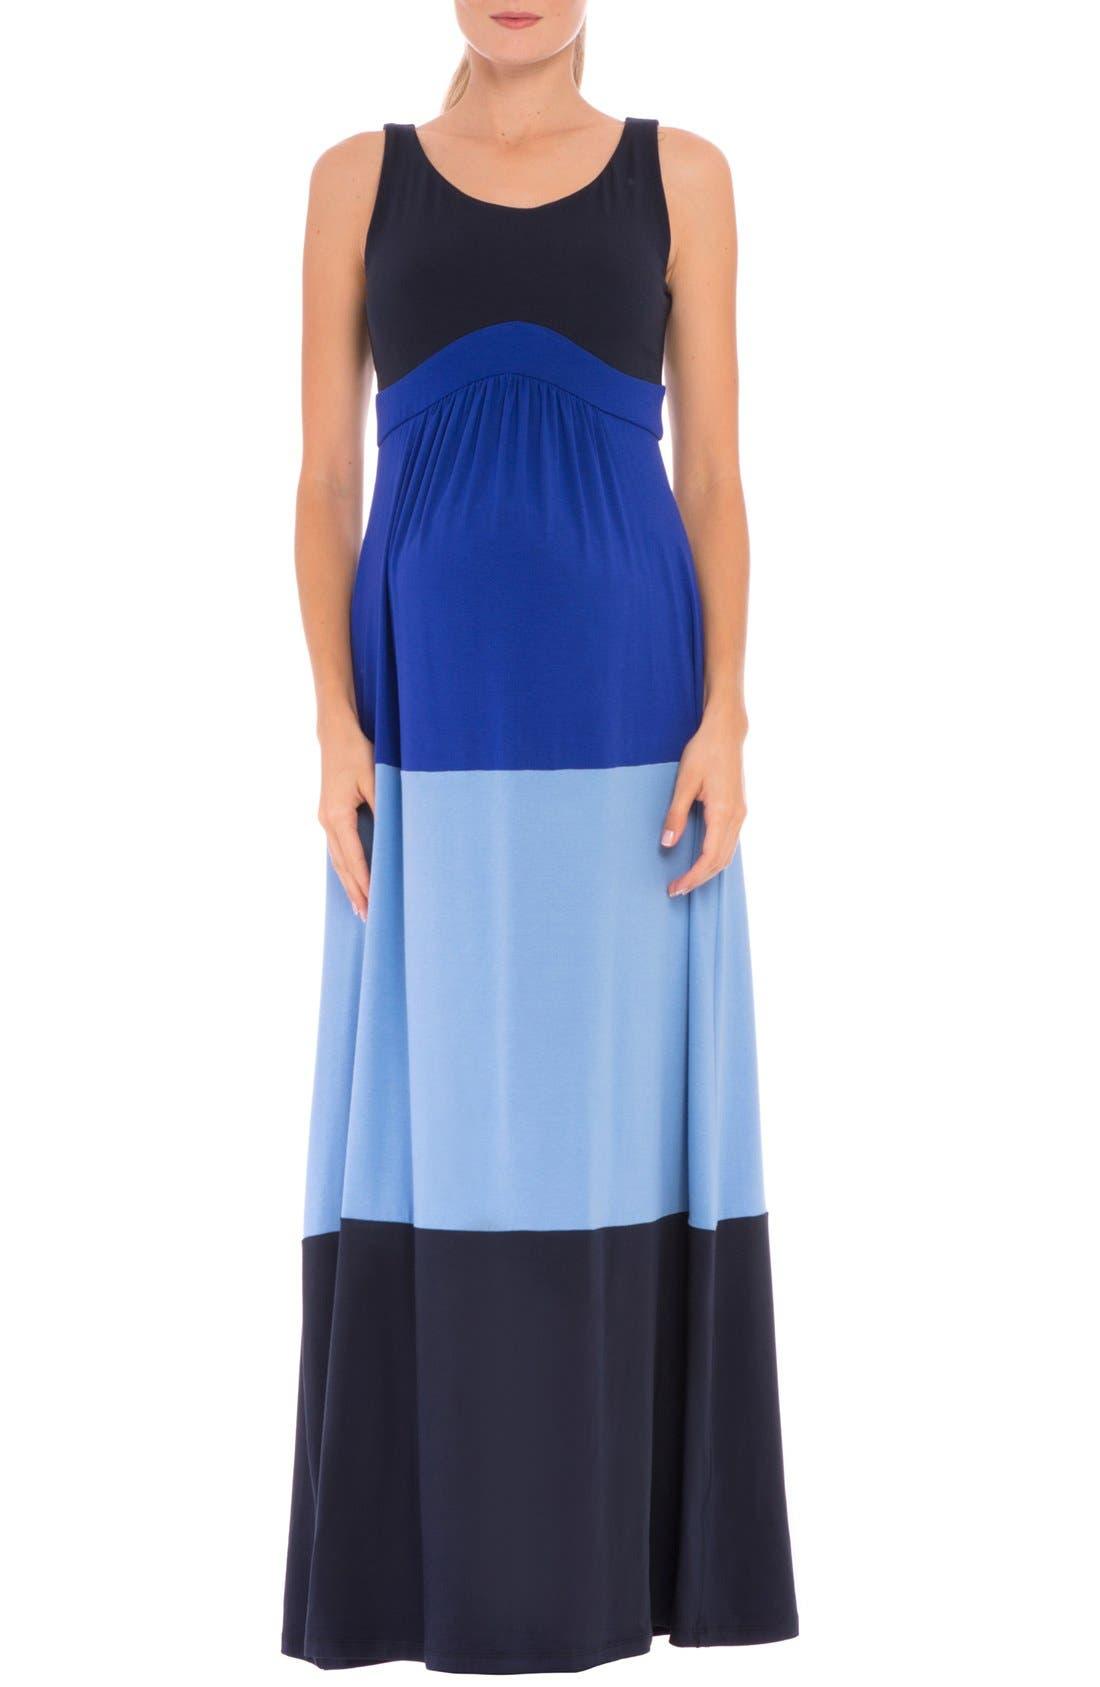 Alternate Image 1 Selected - Olian 'Margarette' Colorblock Maternity Tank Dress